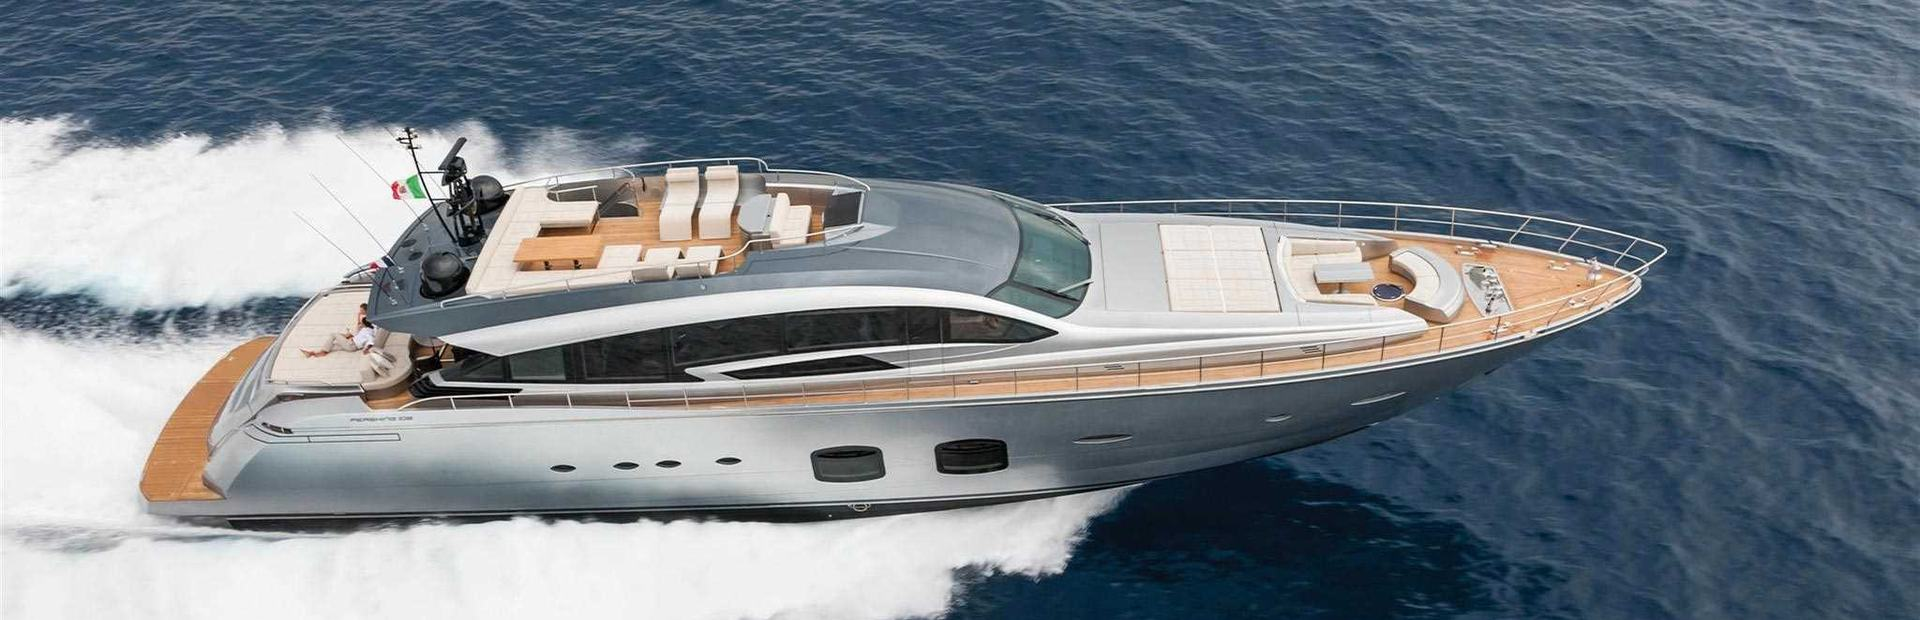 Pershing 108 Yacht Charter